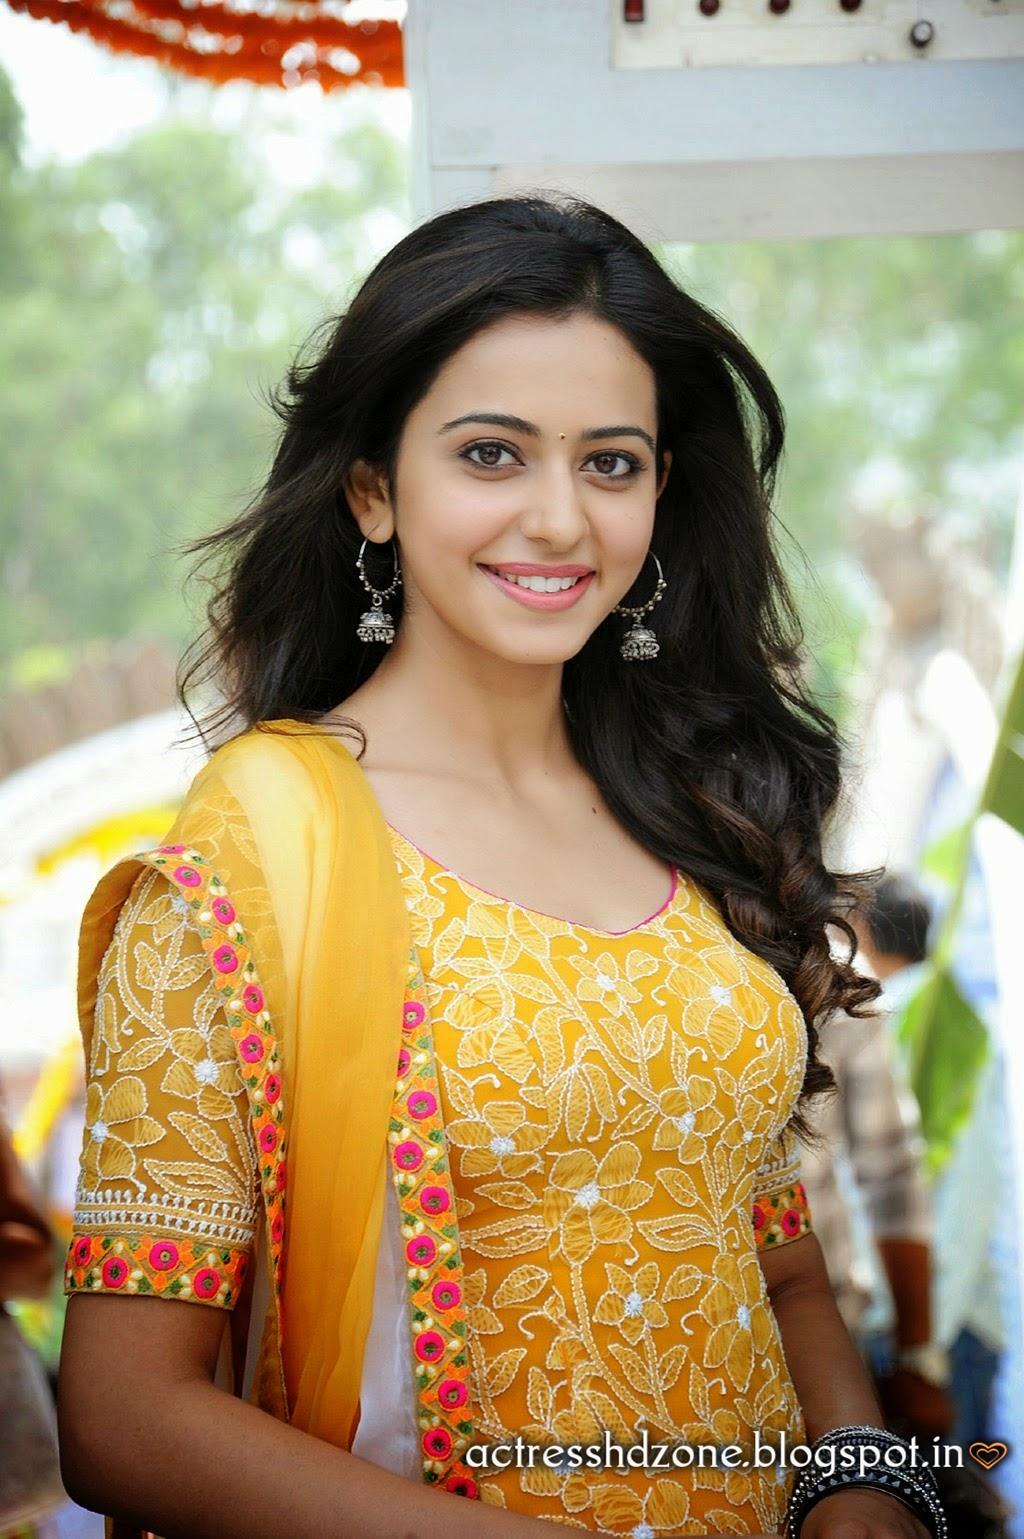 South Indian Actress Wallpapers In Hd Rakul Preet Sing -9063